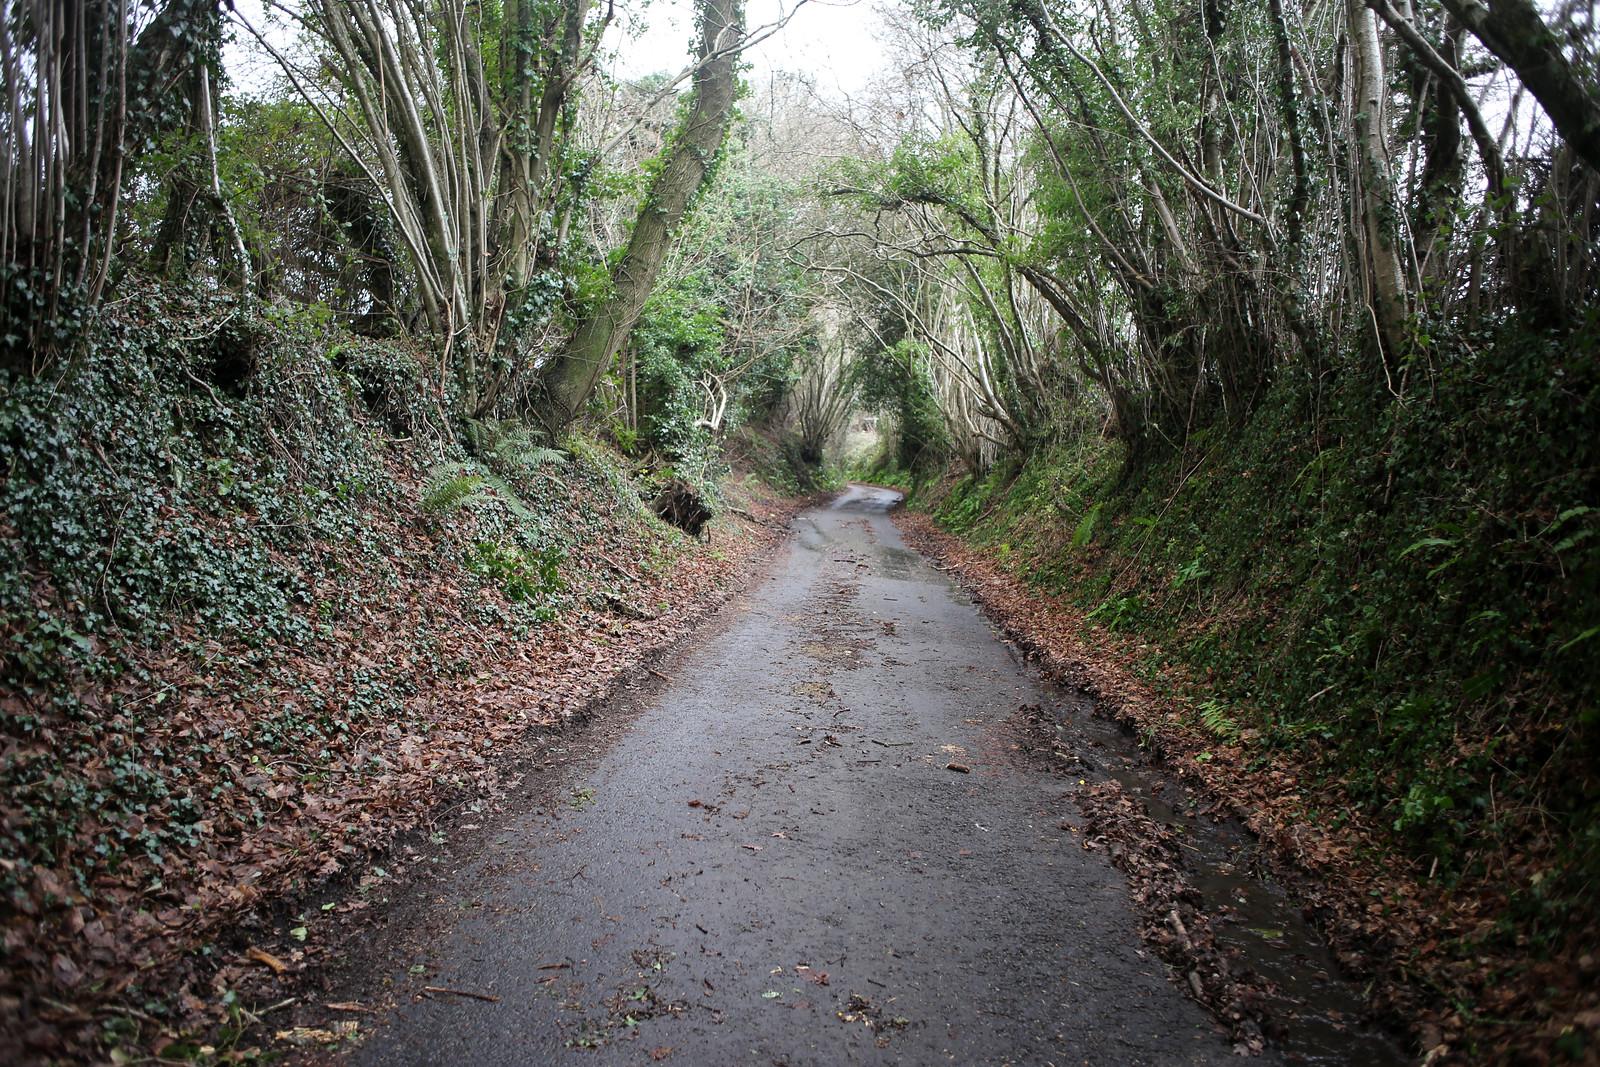 Road near Hawkley